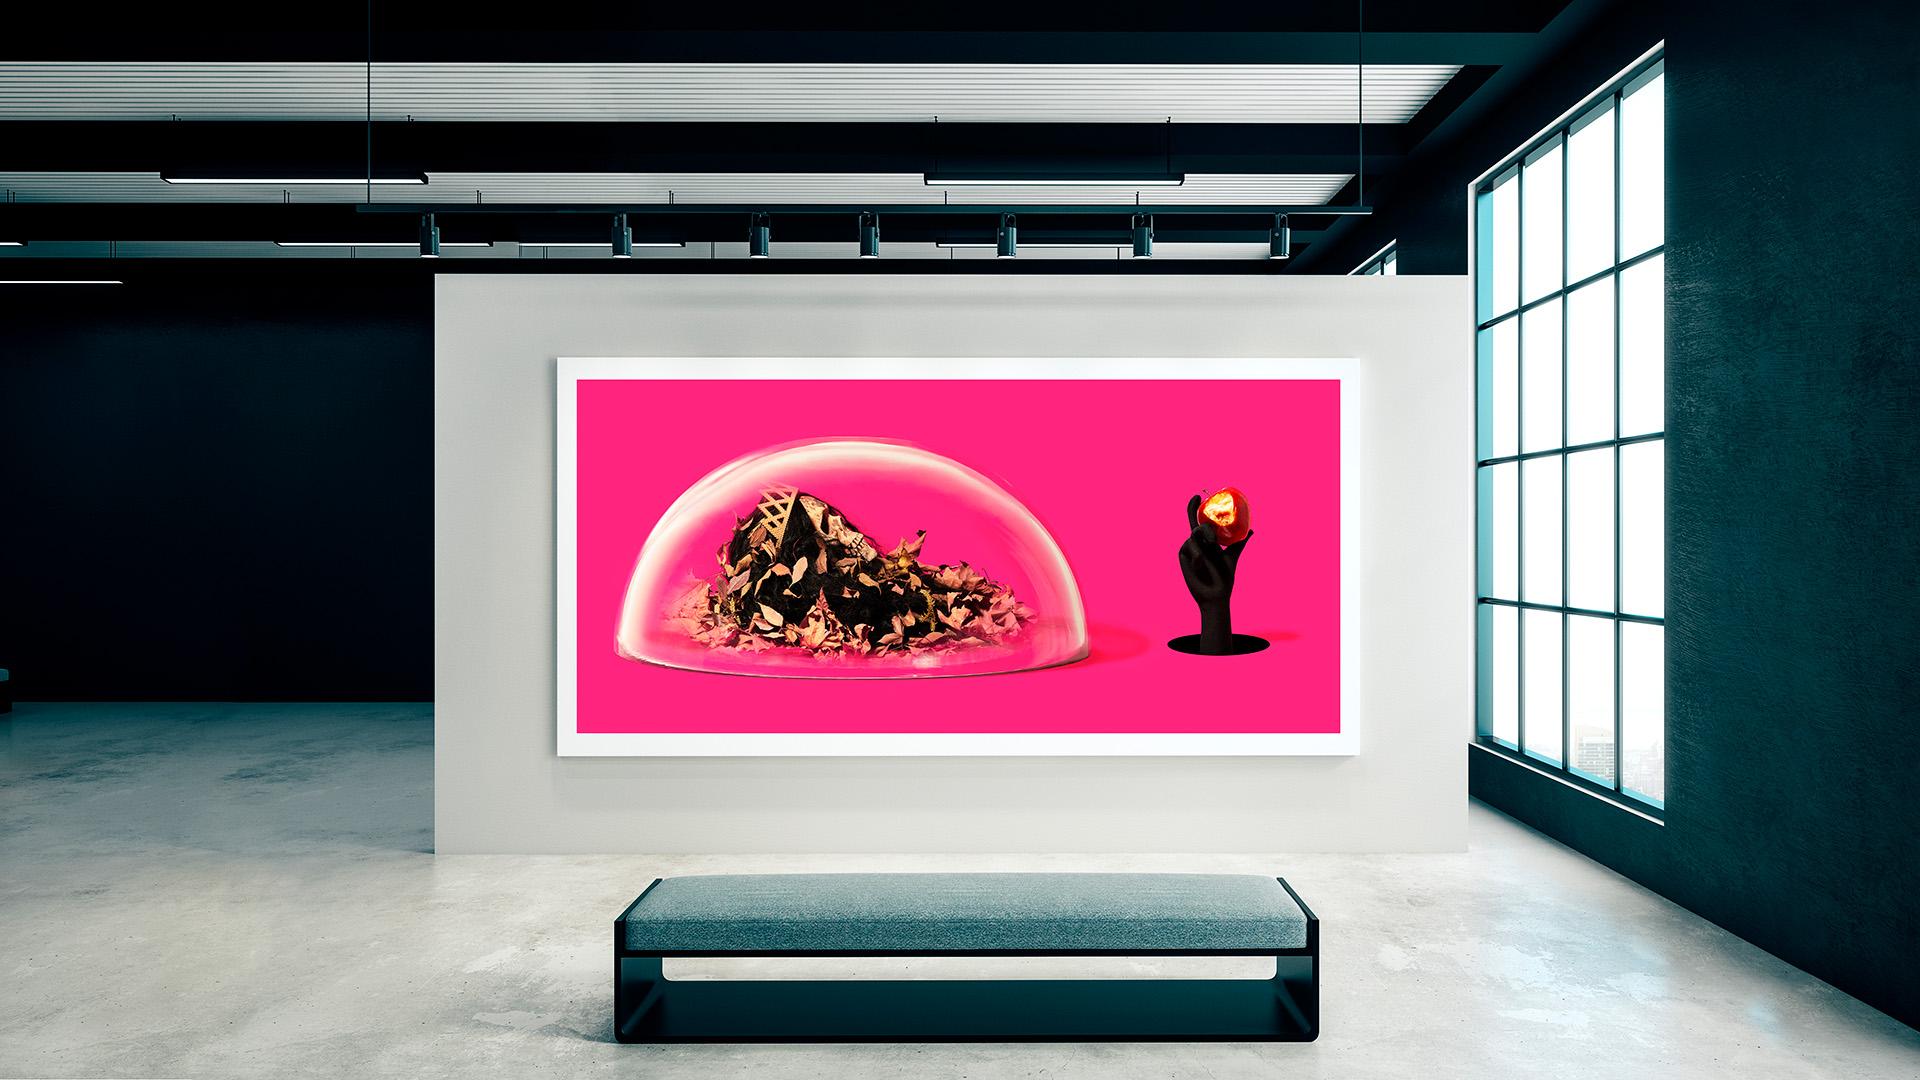 Exposicion-Sintora-Memento-mori-sleeping-beauty-bella-durmiente-Horno-Art-Virtual-Gallery-galeria-arte-fotografia-artistica-decorativa